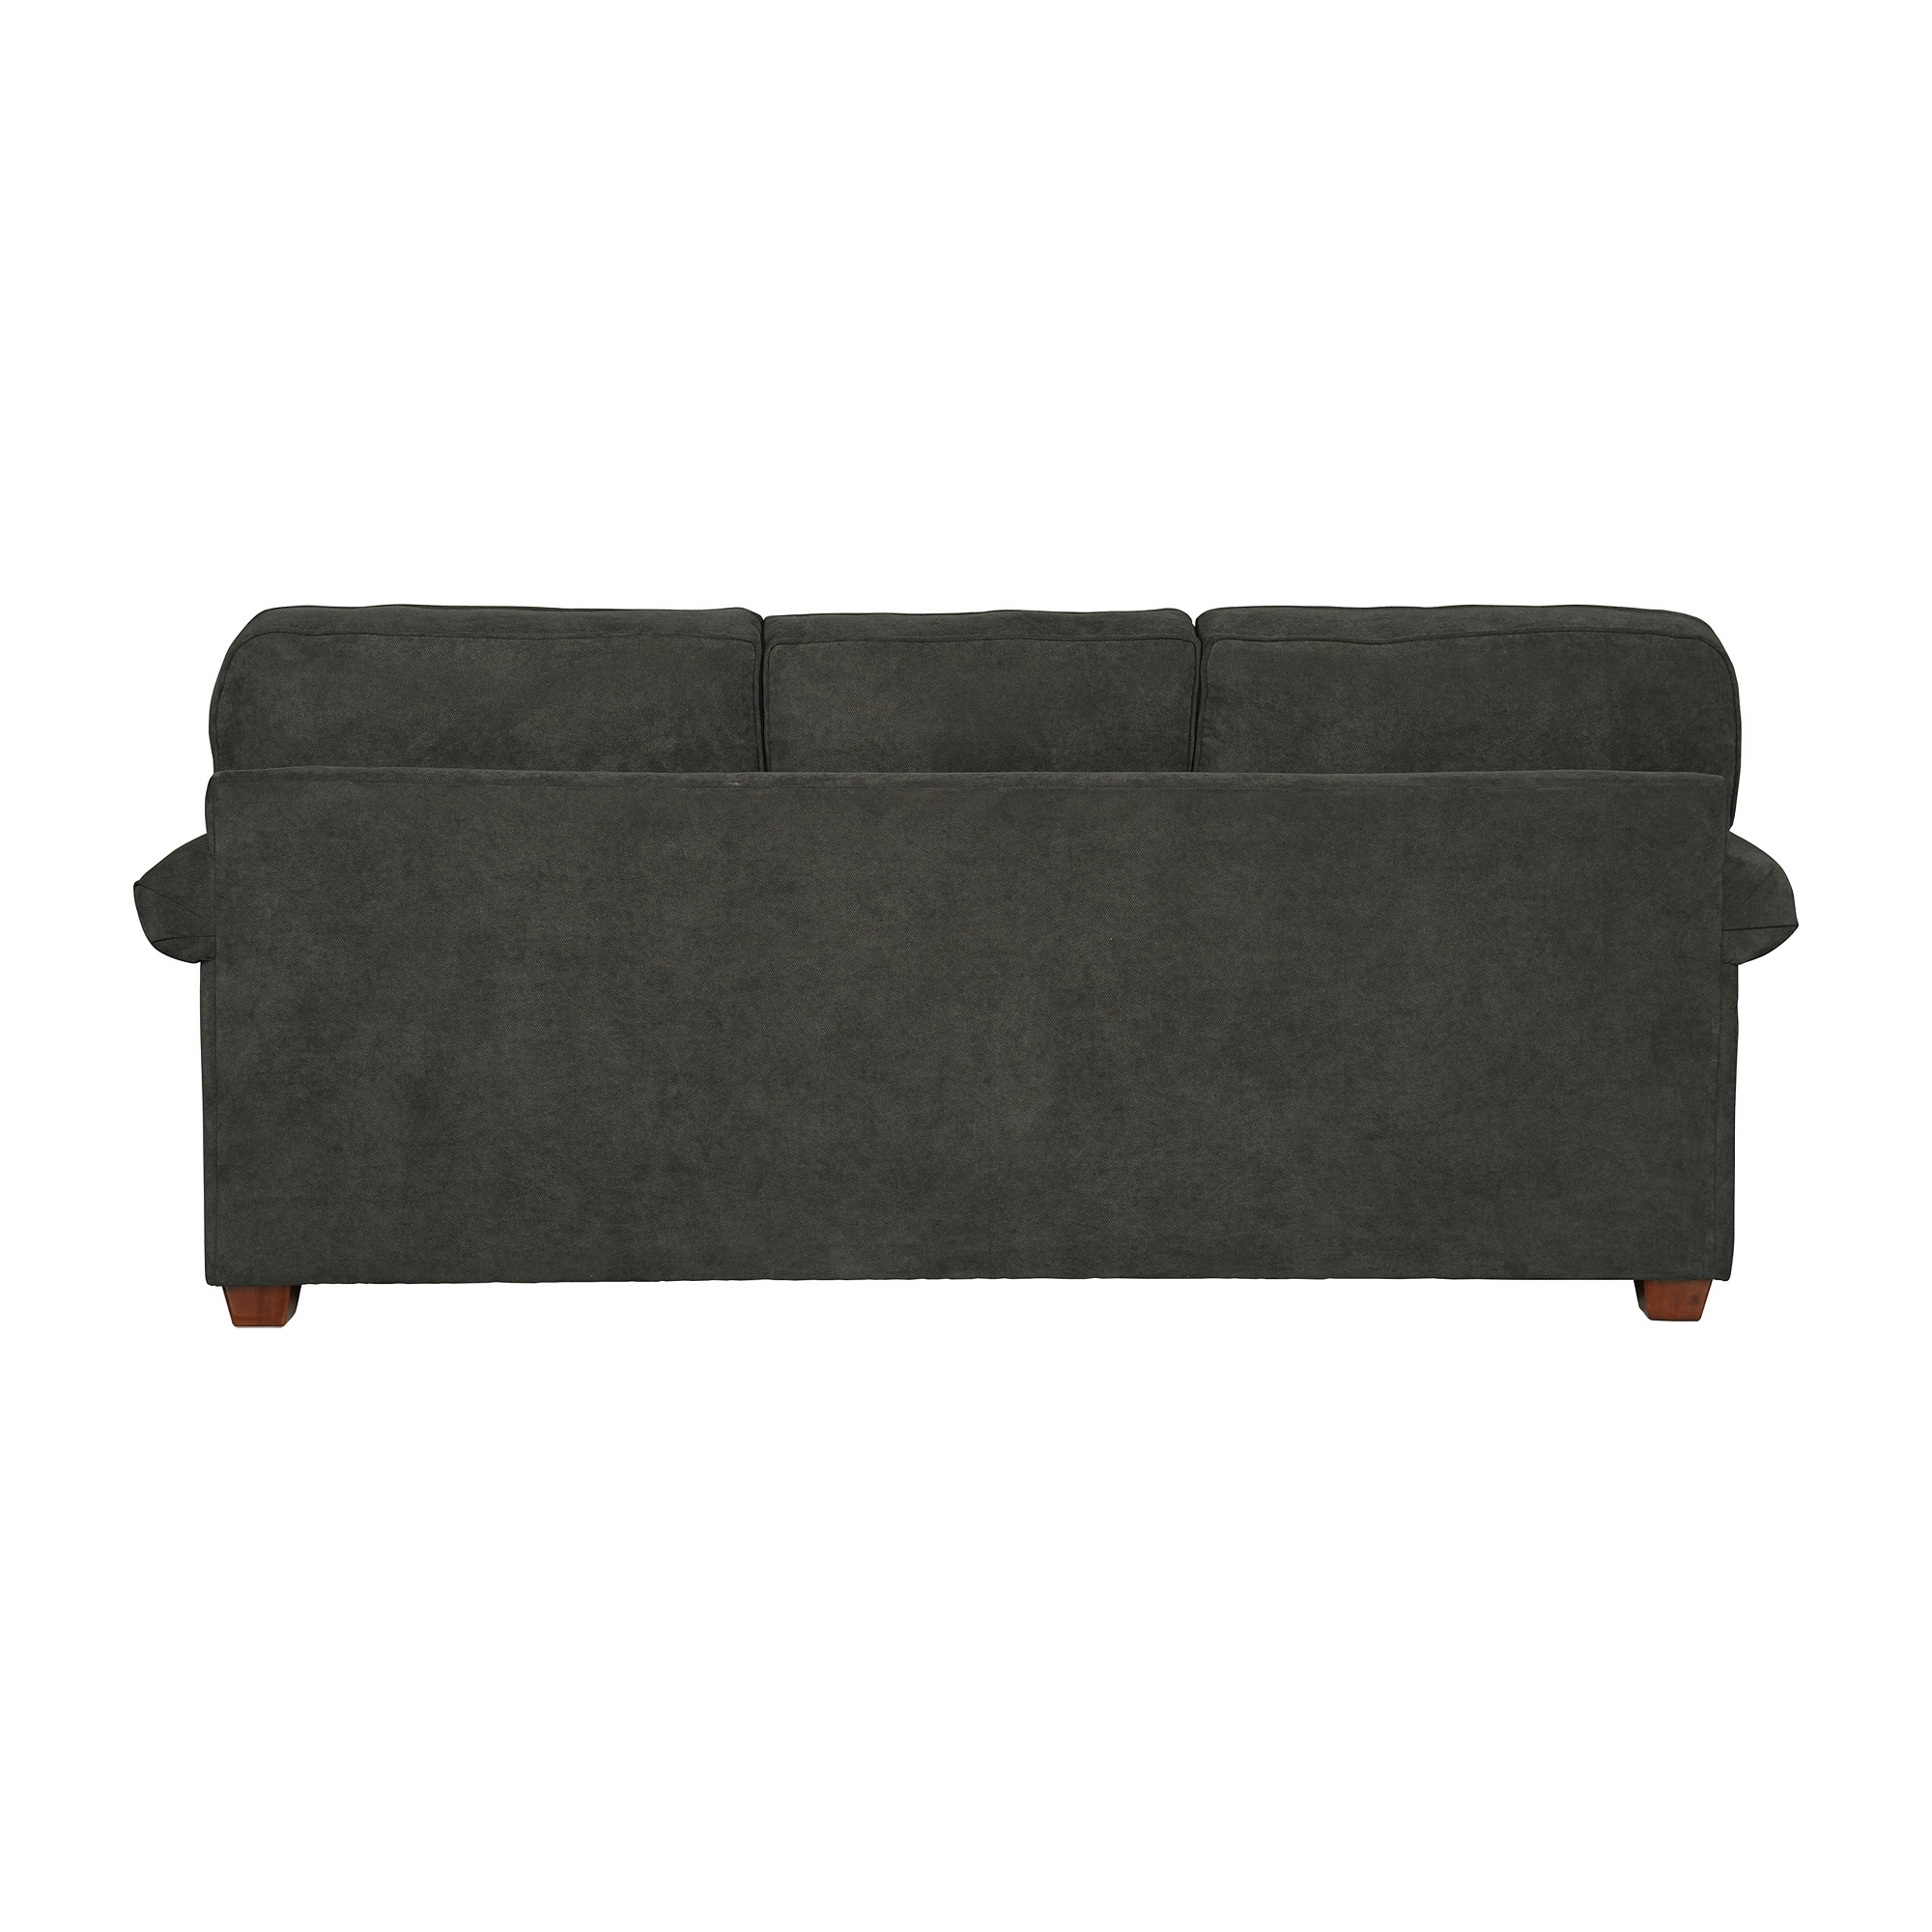 Wondrous Kara Sofa Machost Co Dining Chair Design Ideas Machostcouk